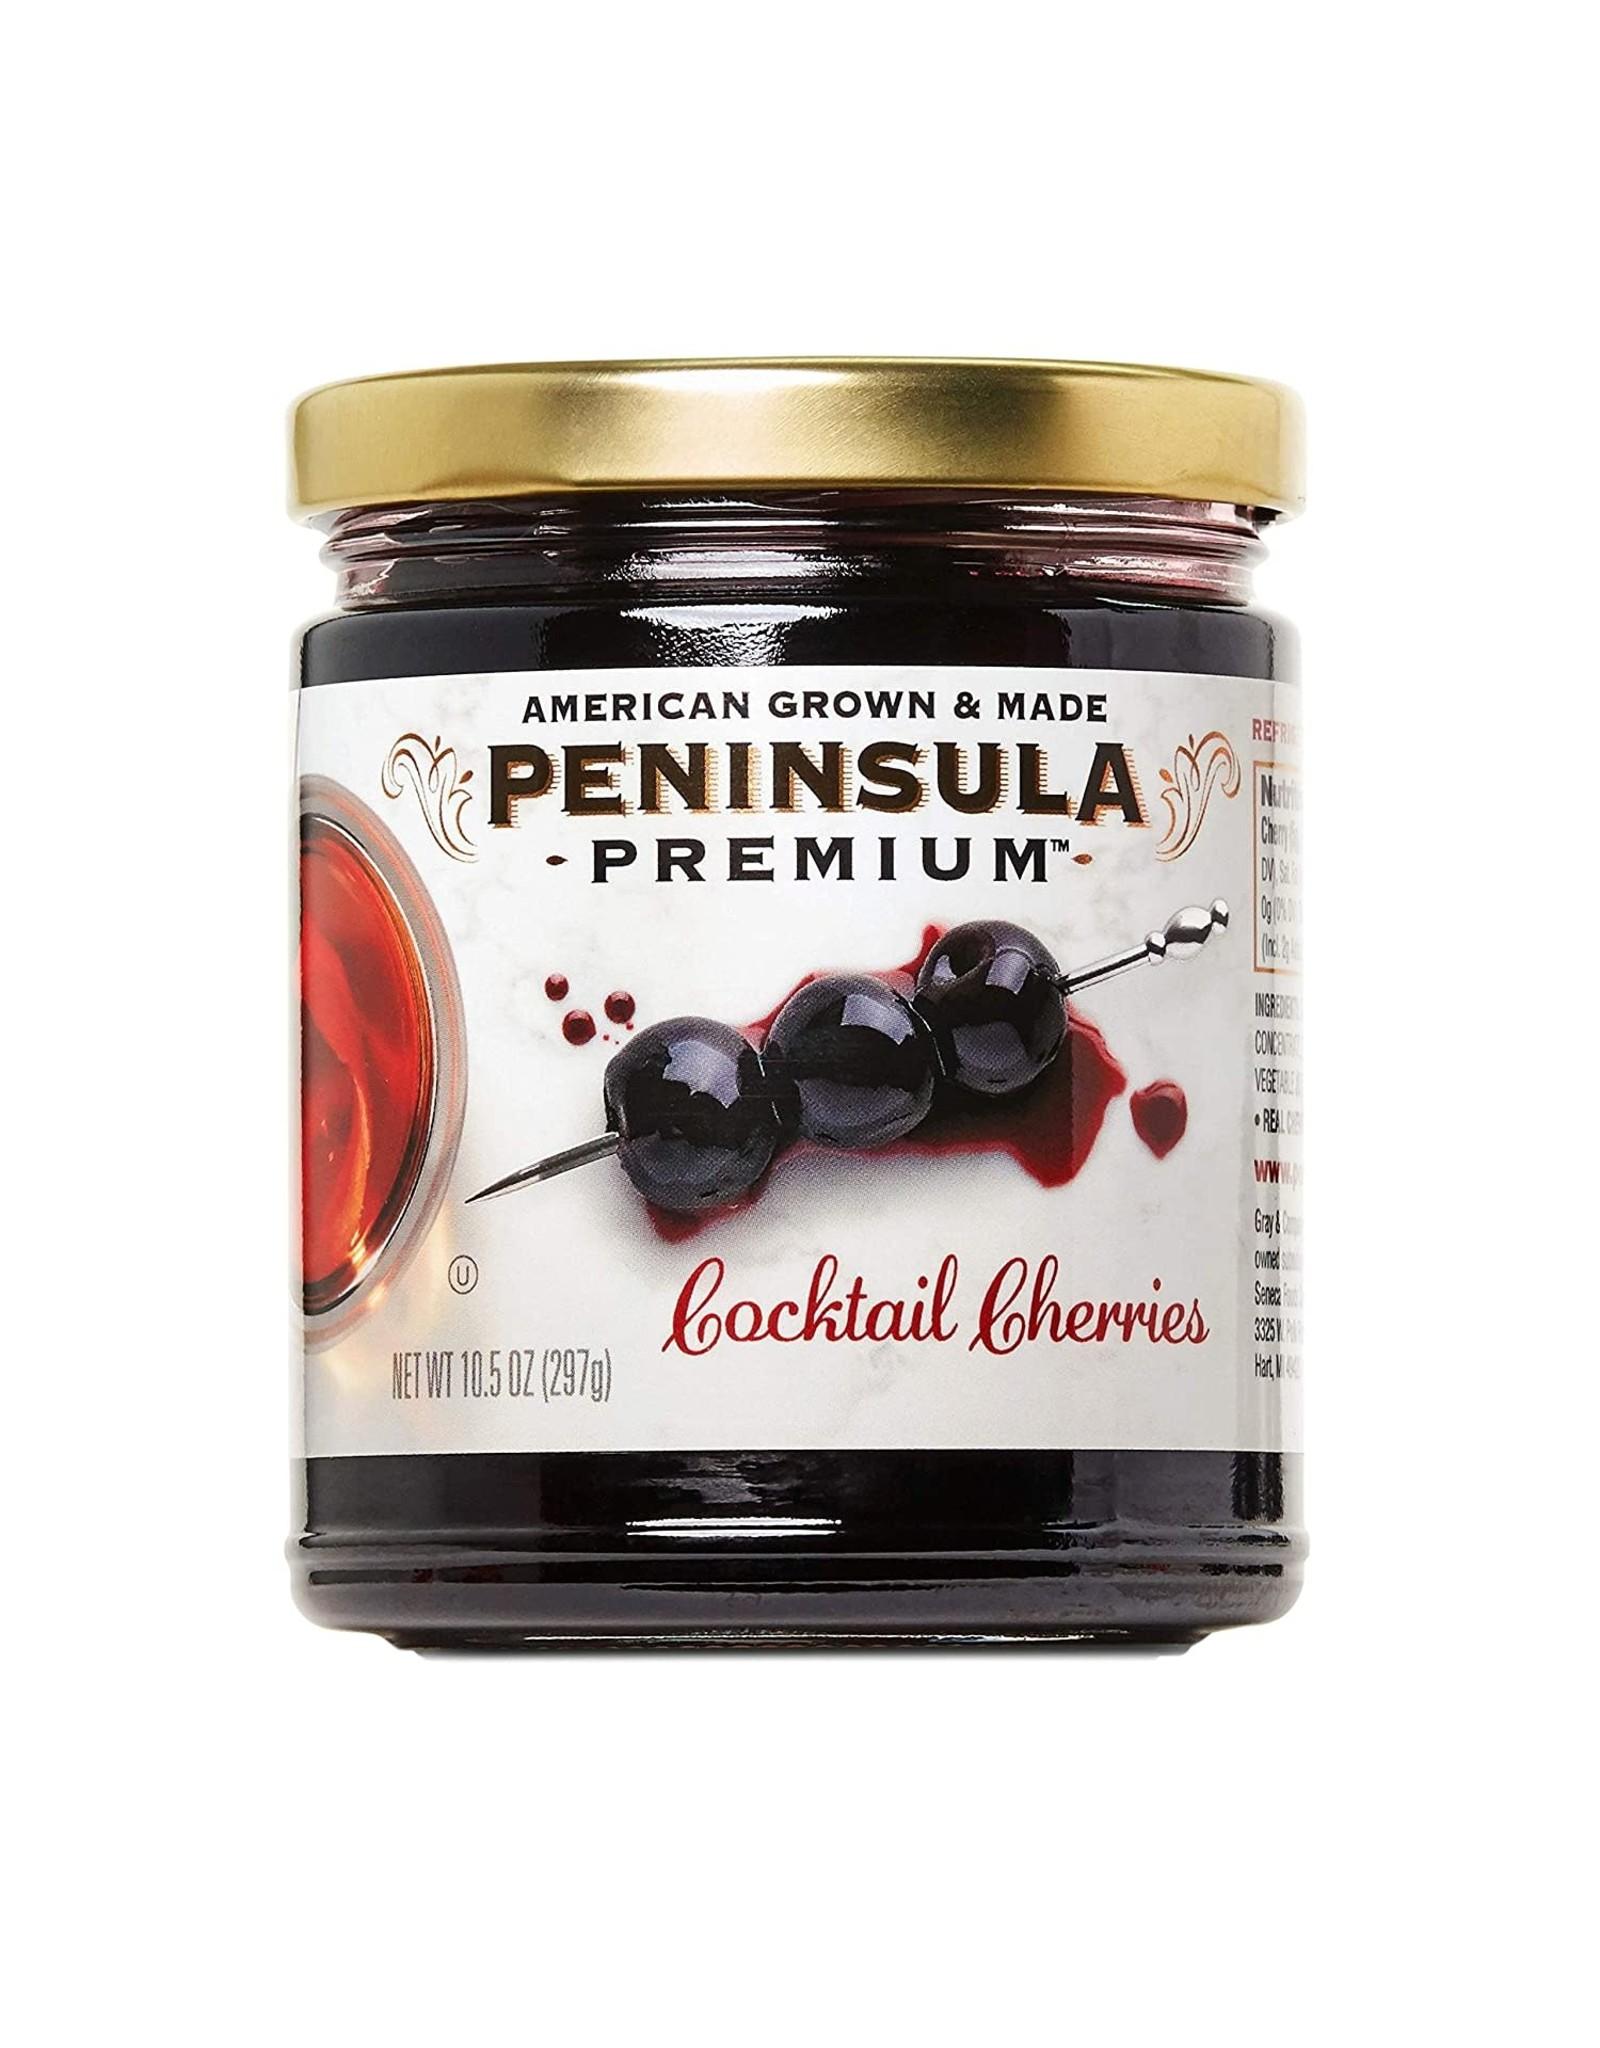 PENINSULA COCKTAIL CHERRIES 10.5OZ